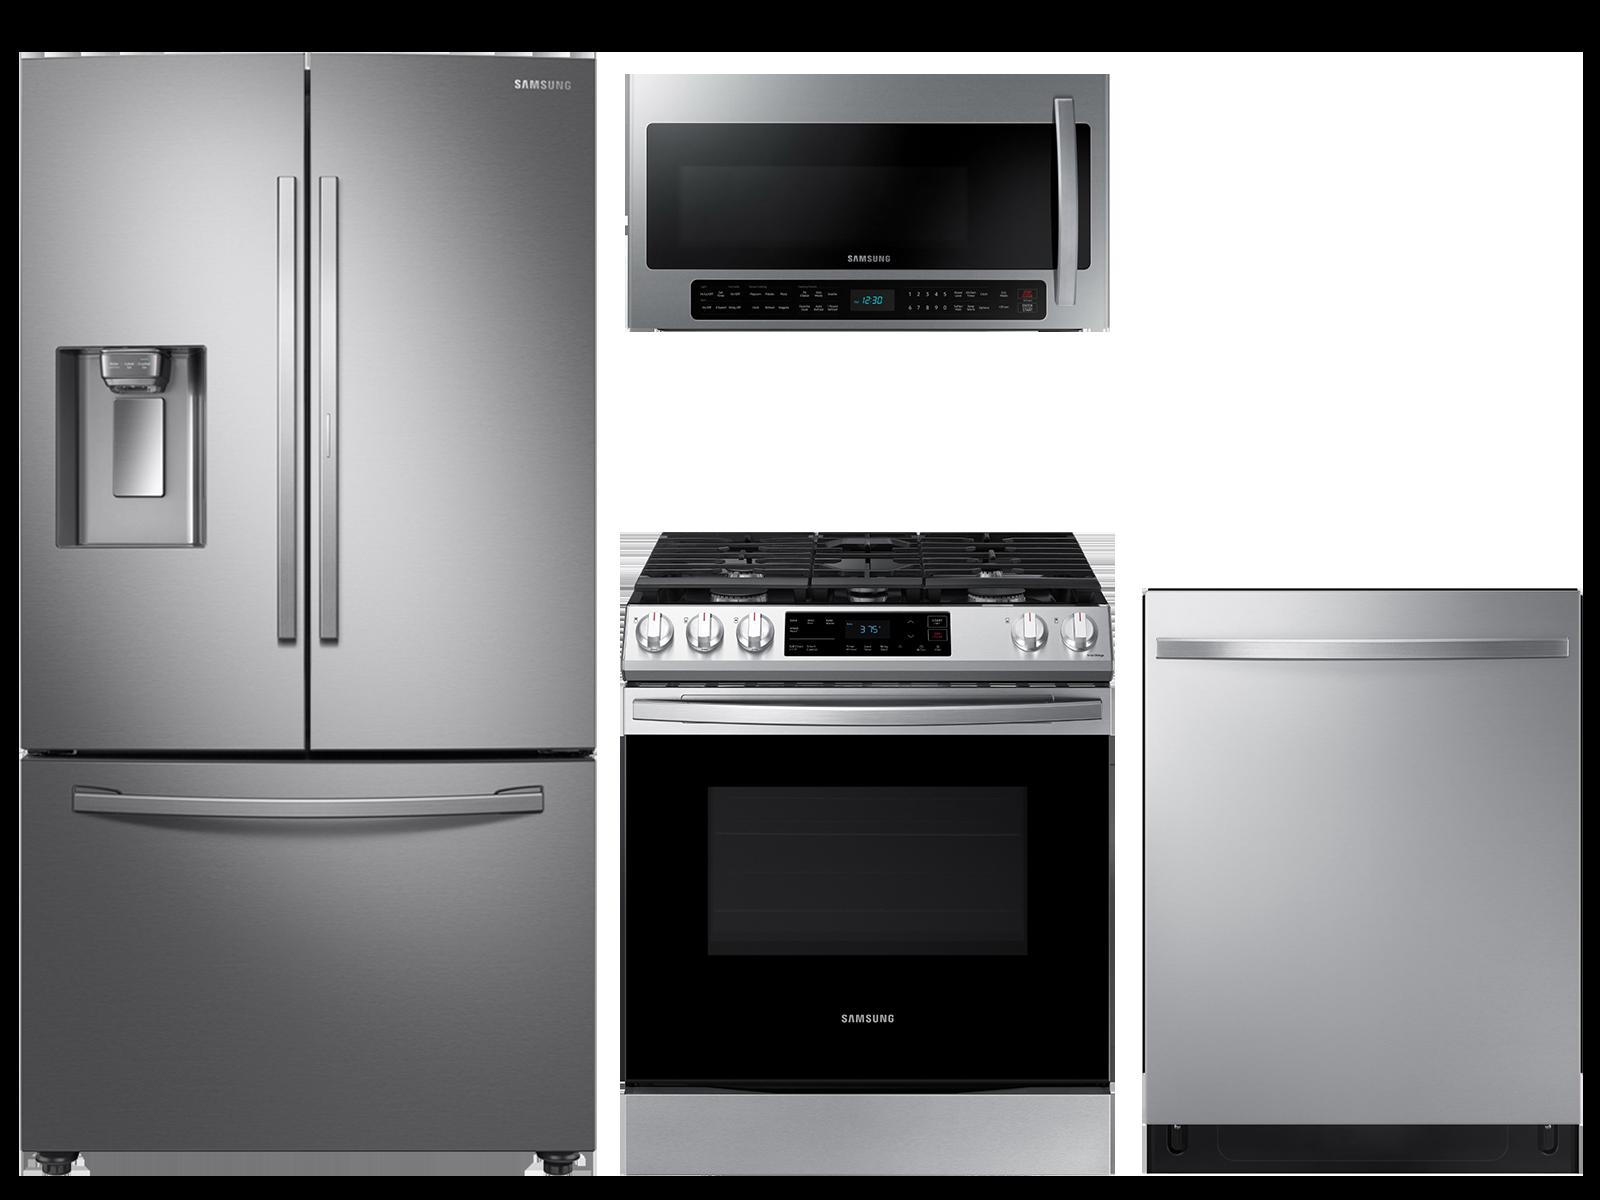 28 cu. ft. full depth 3-door refrigerator, gas range, 2.1 cu. ft. microwave and modern-look dishwasher package